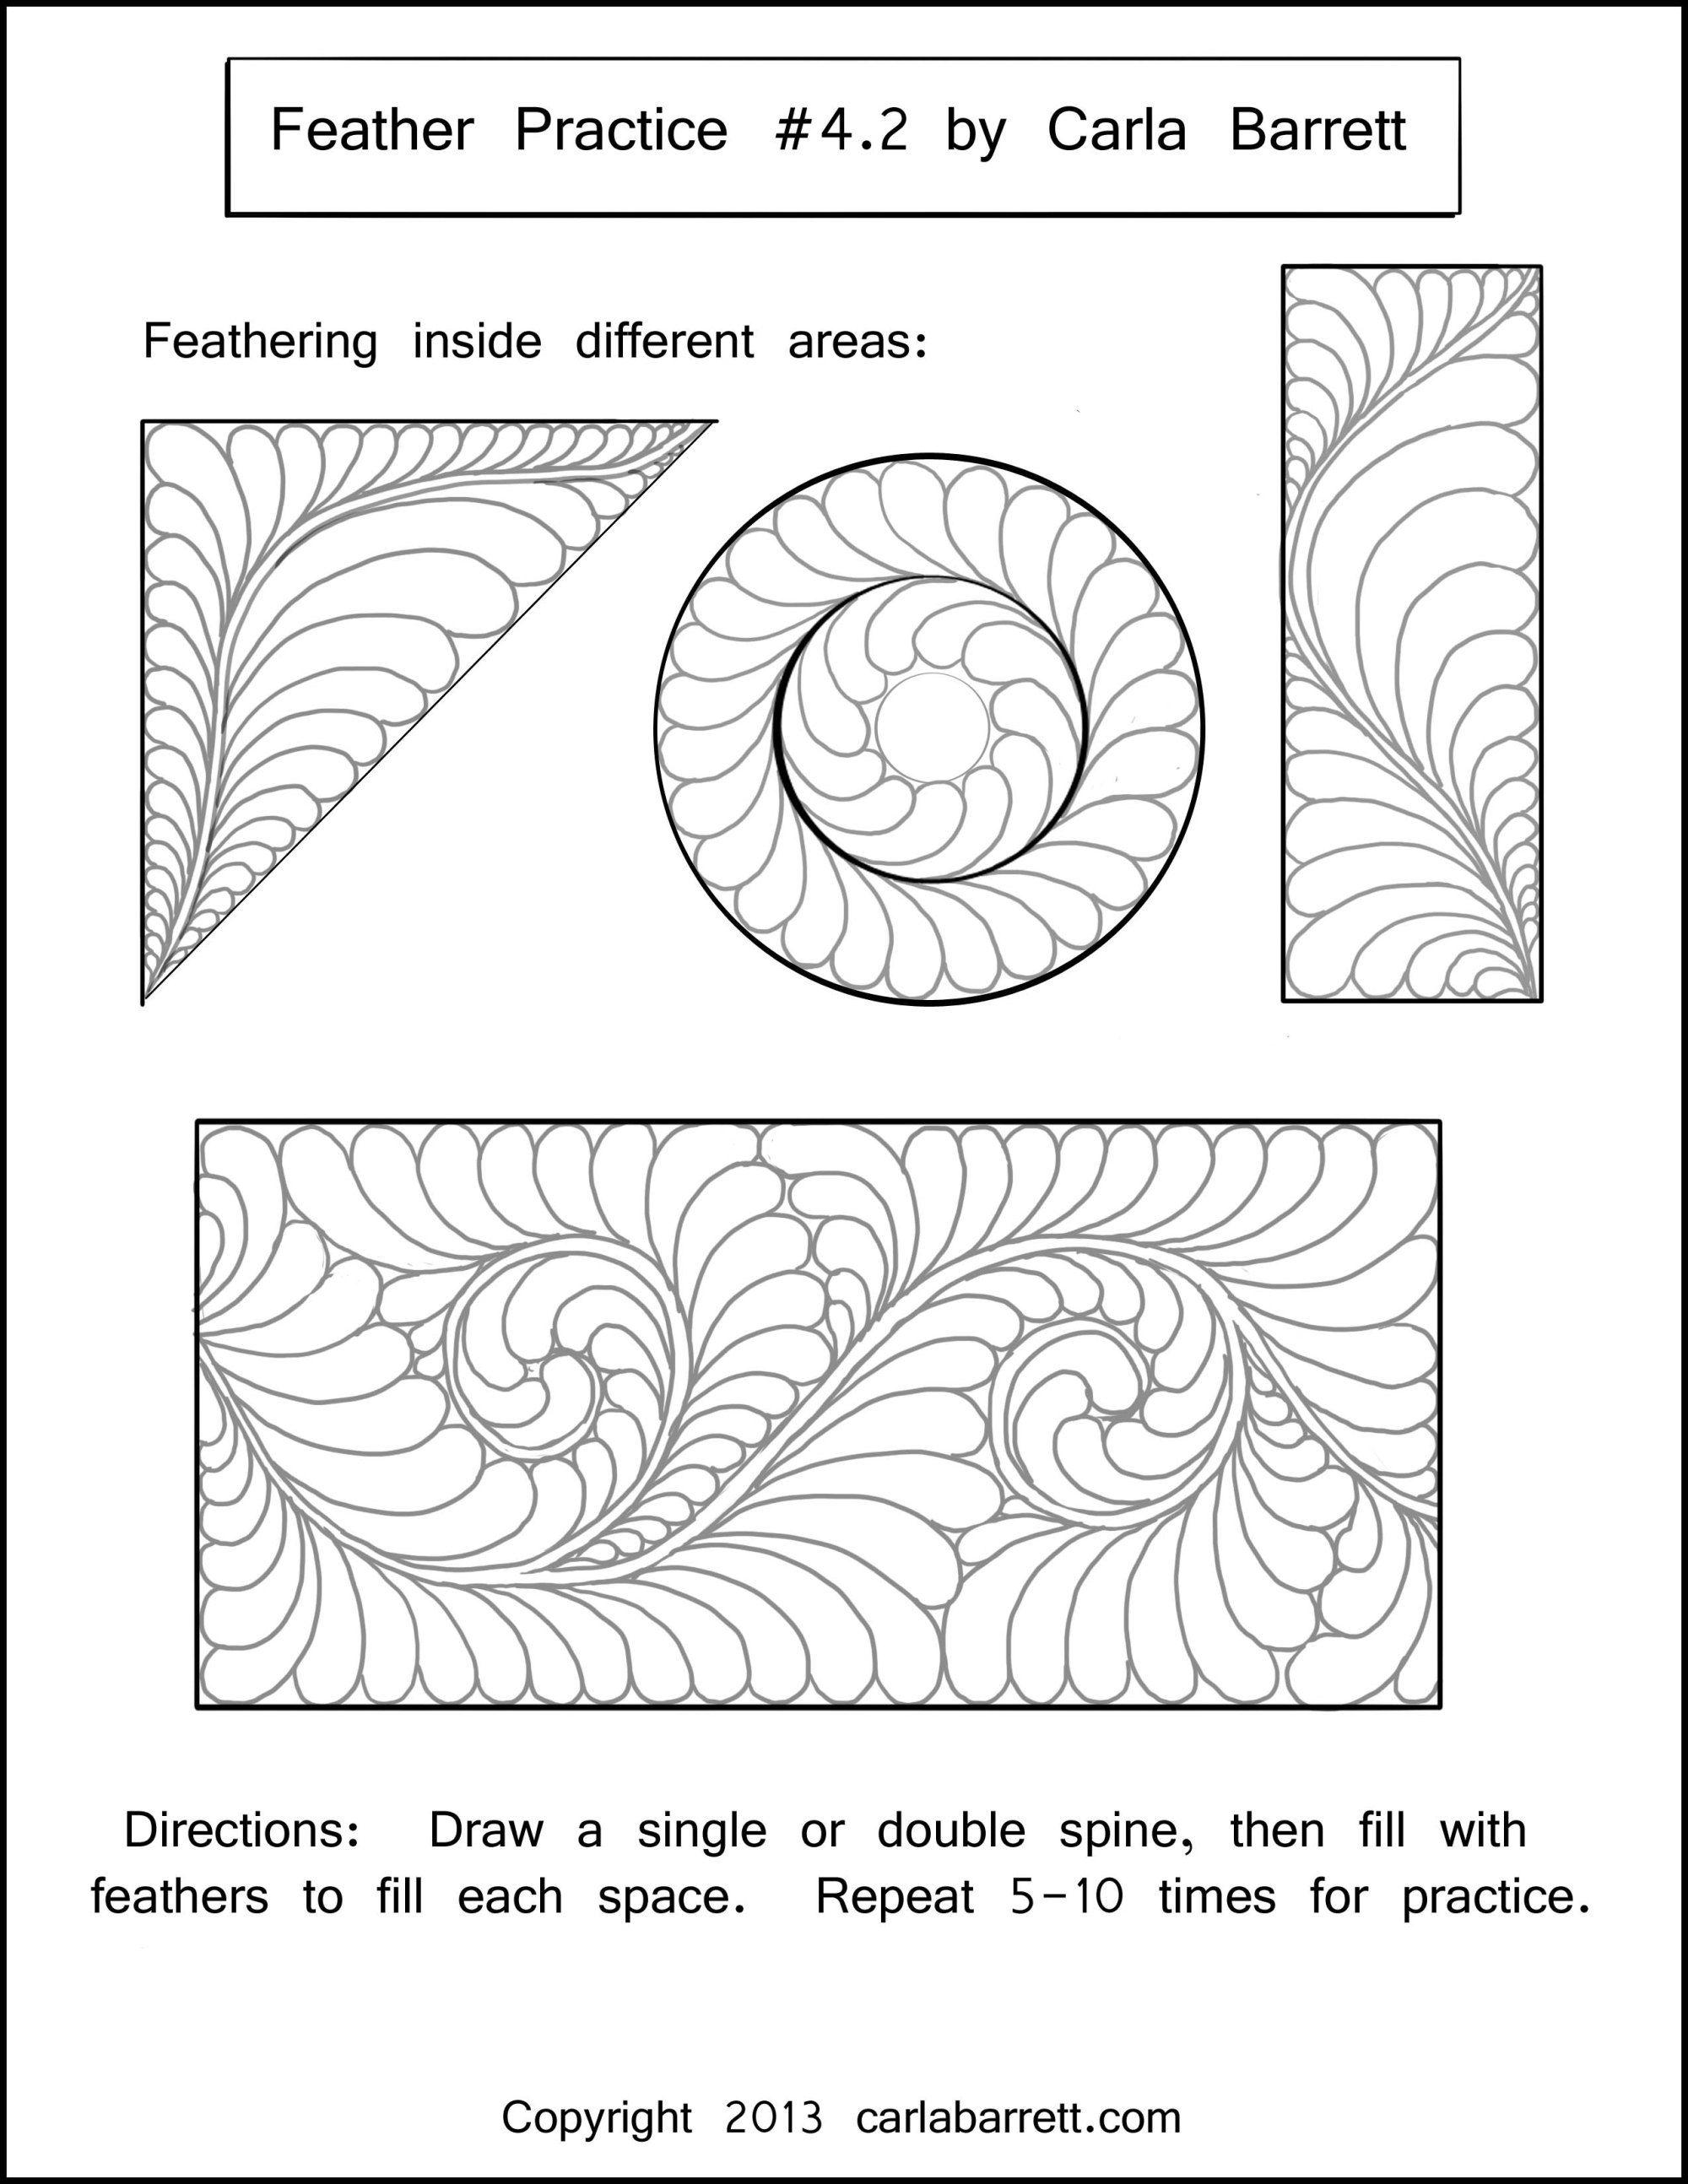 Worksheet Example By Carla Barrett